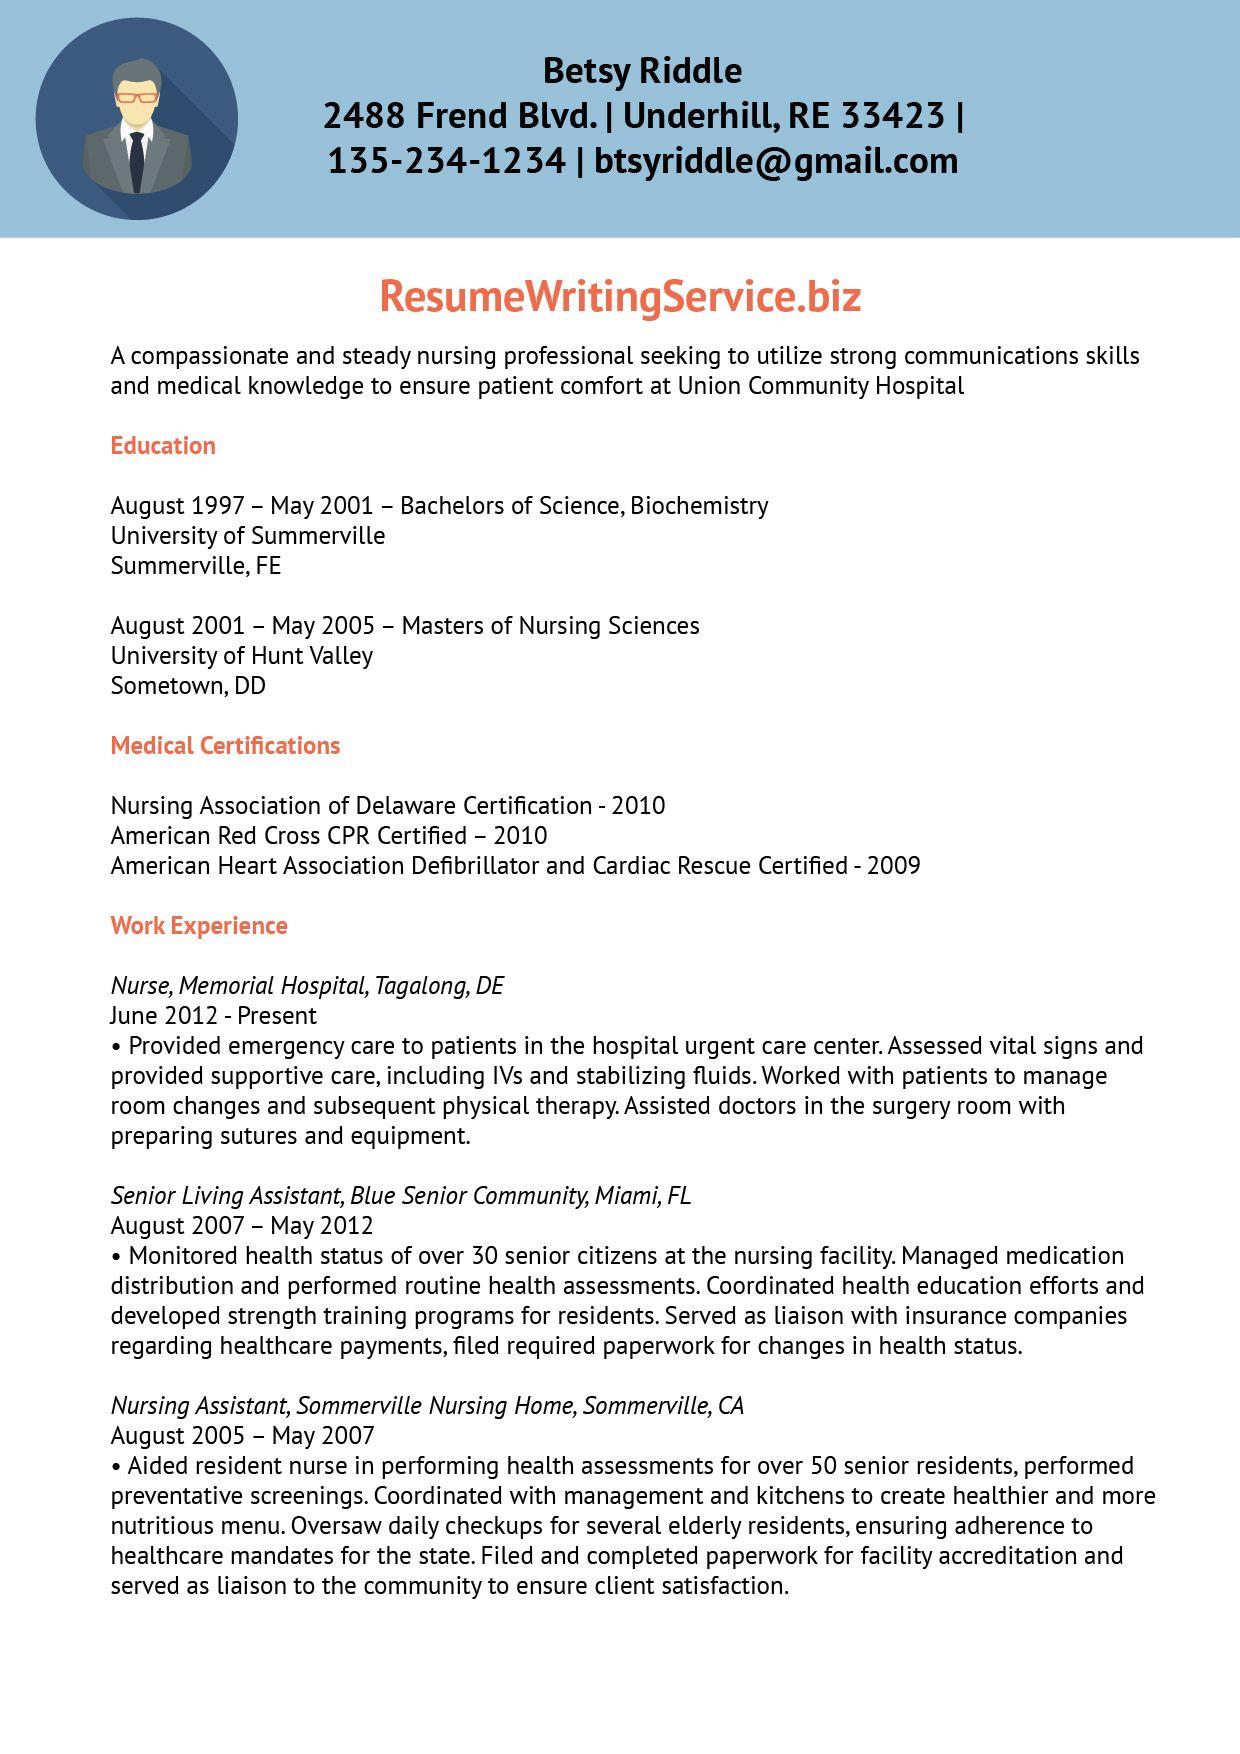 Nurse Resume Sample Student and Career Nursing resume